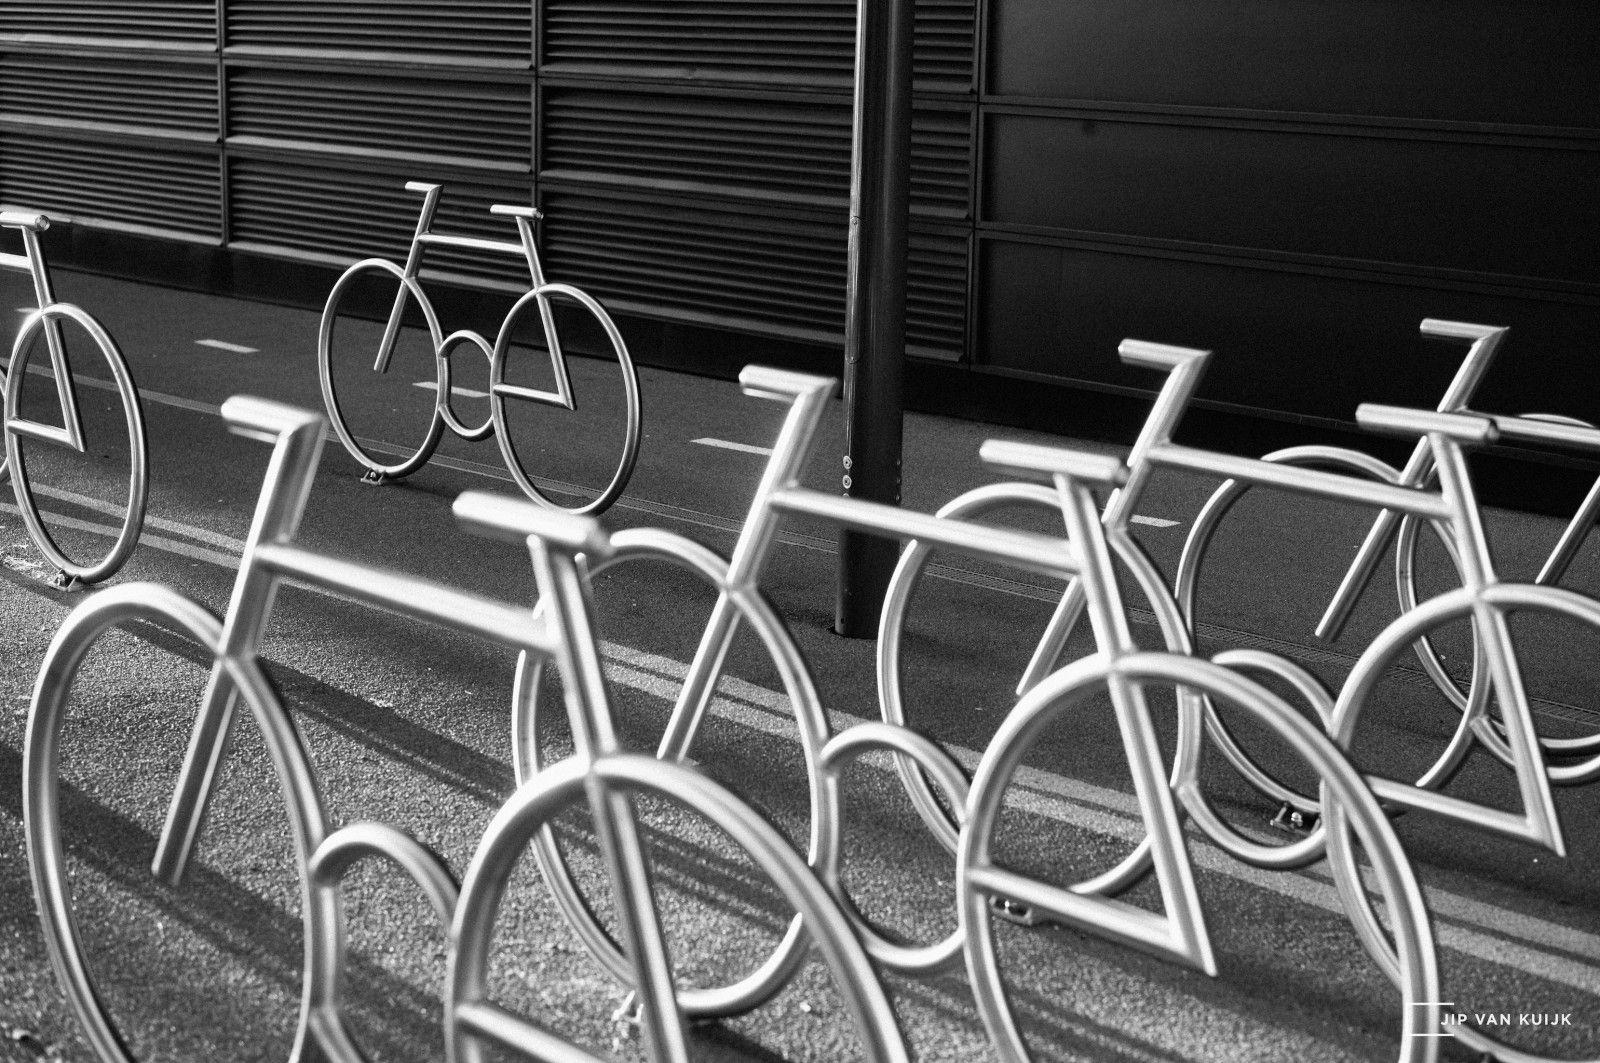 bikes_oslo_norway_barcode_jipvankuijk_70mm_leica_se_mediumformat